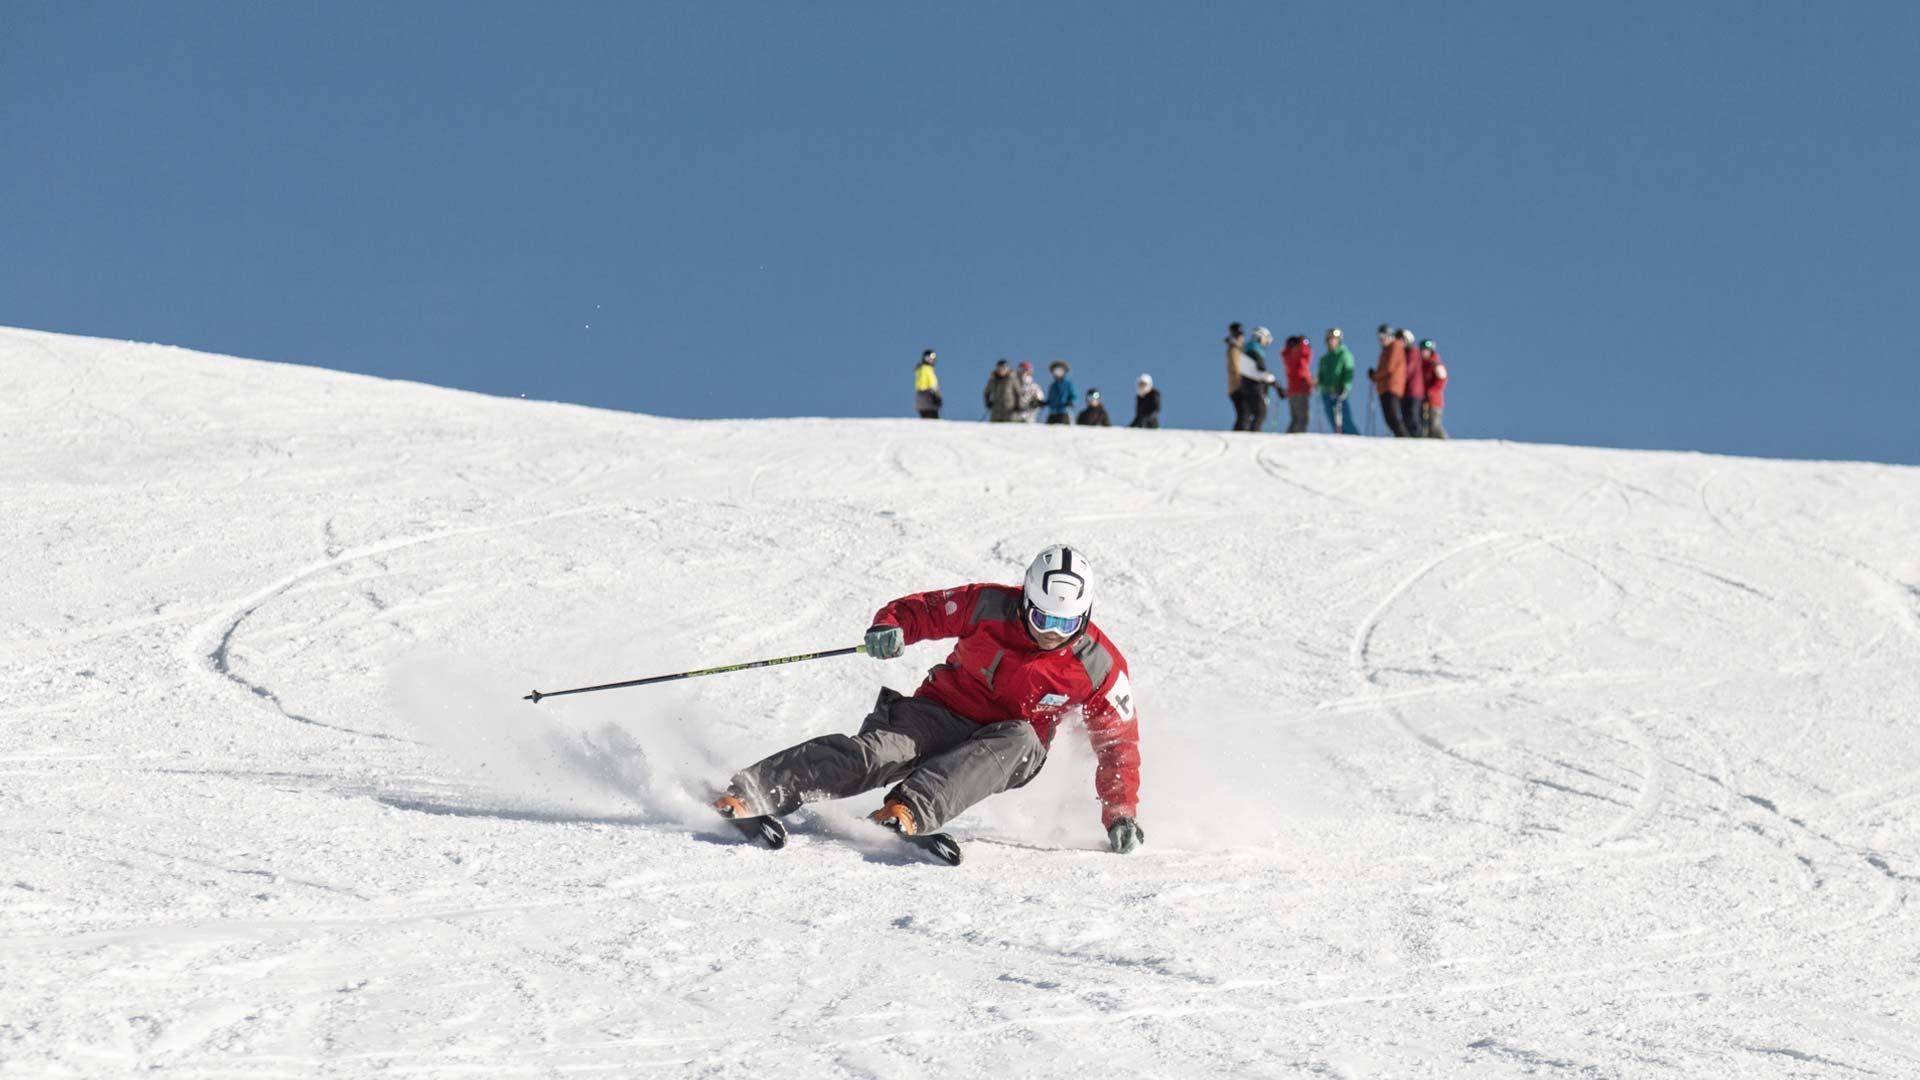 CSIA Ski Instructor Internship, Banff, Canada | Nonstop Snow